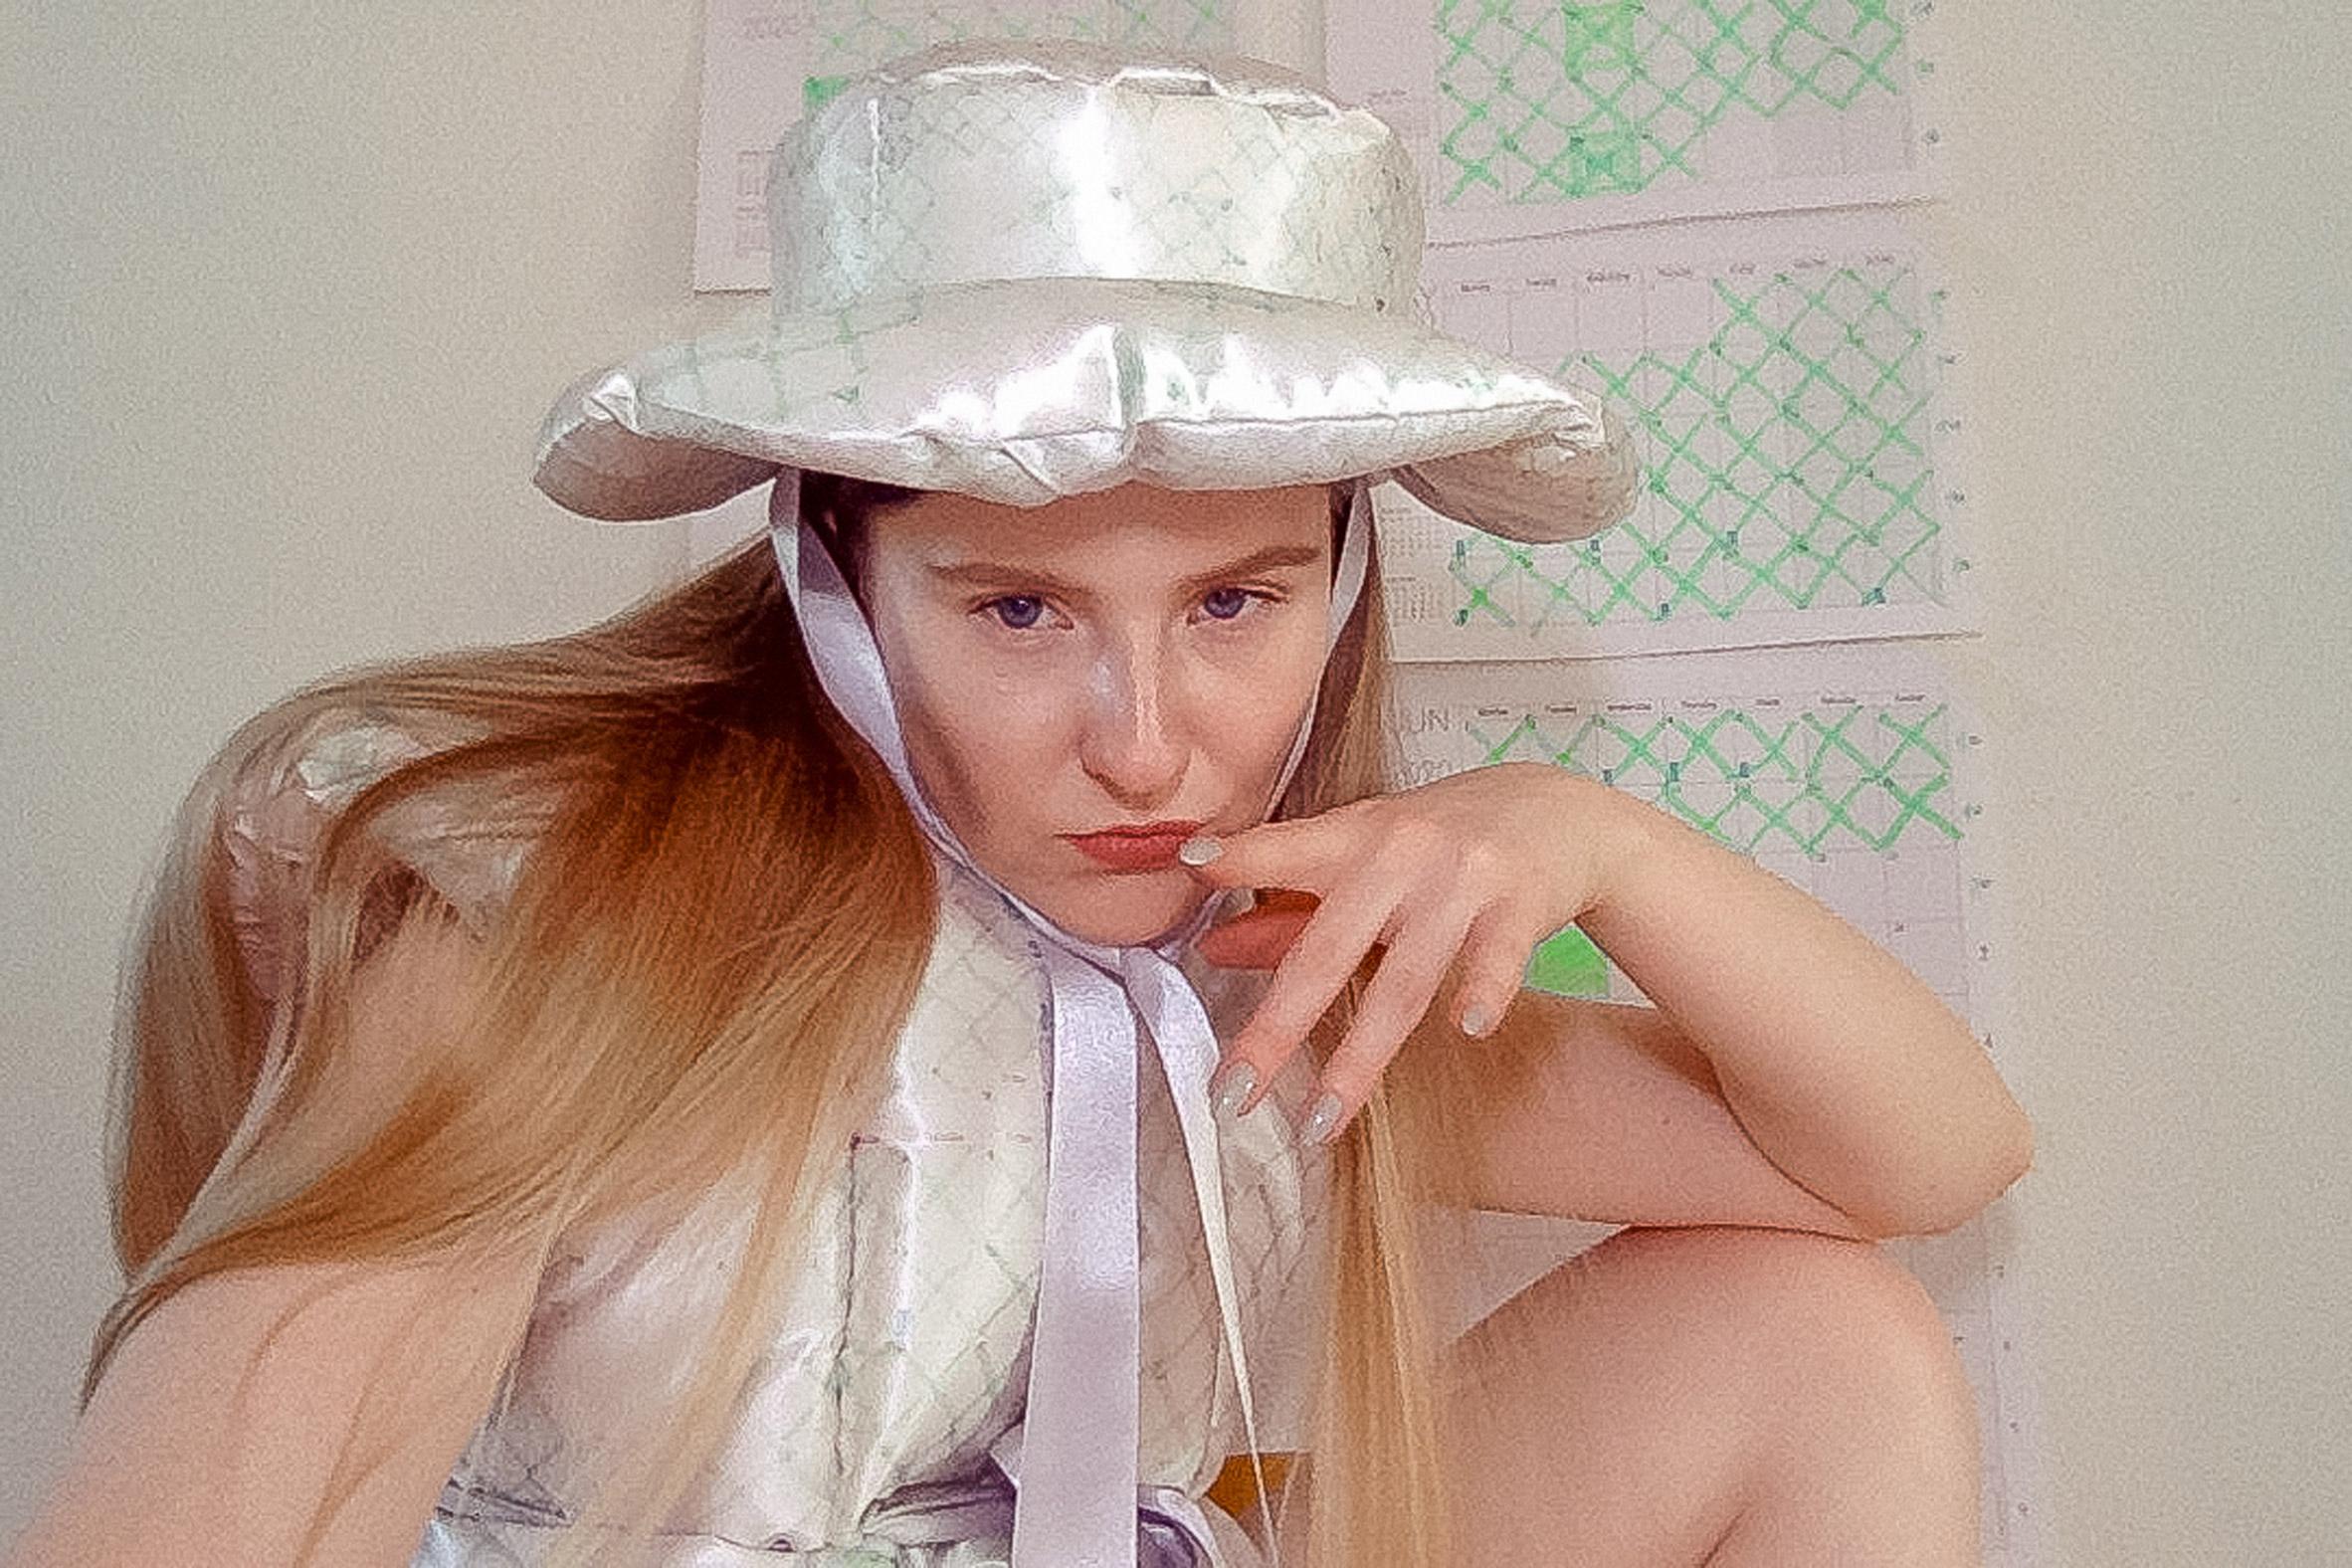 Santa Kupča wearing her Hesitant to RSVP duvet-style garment and hat